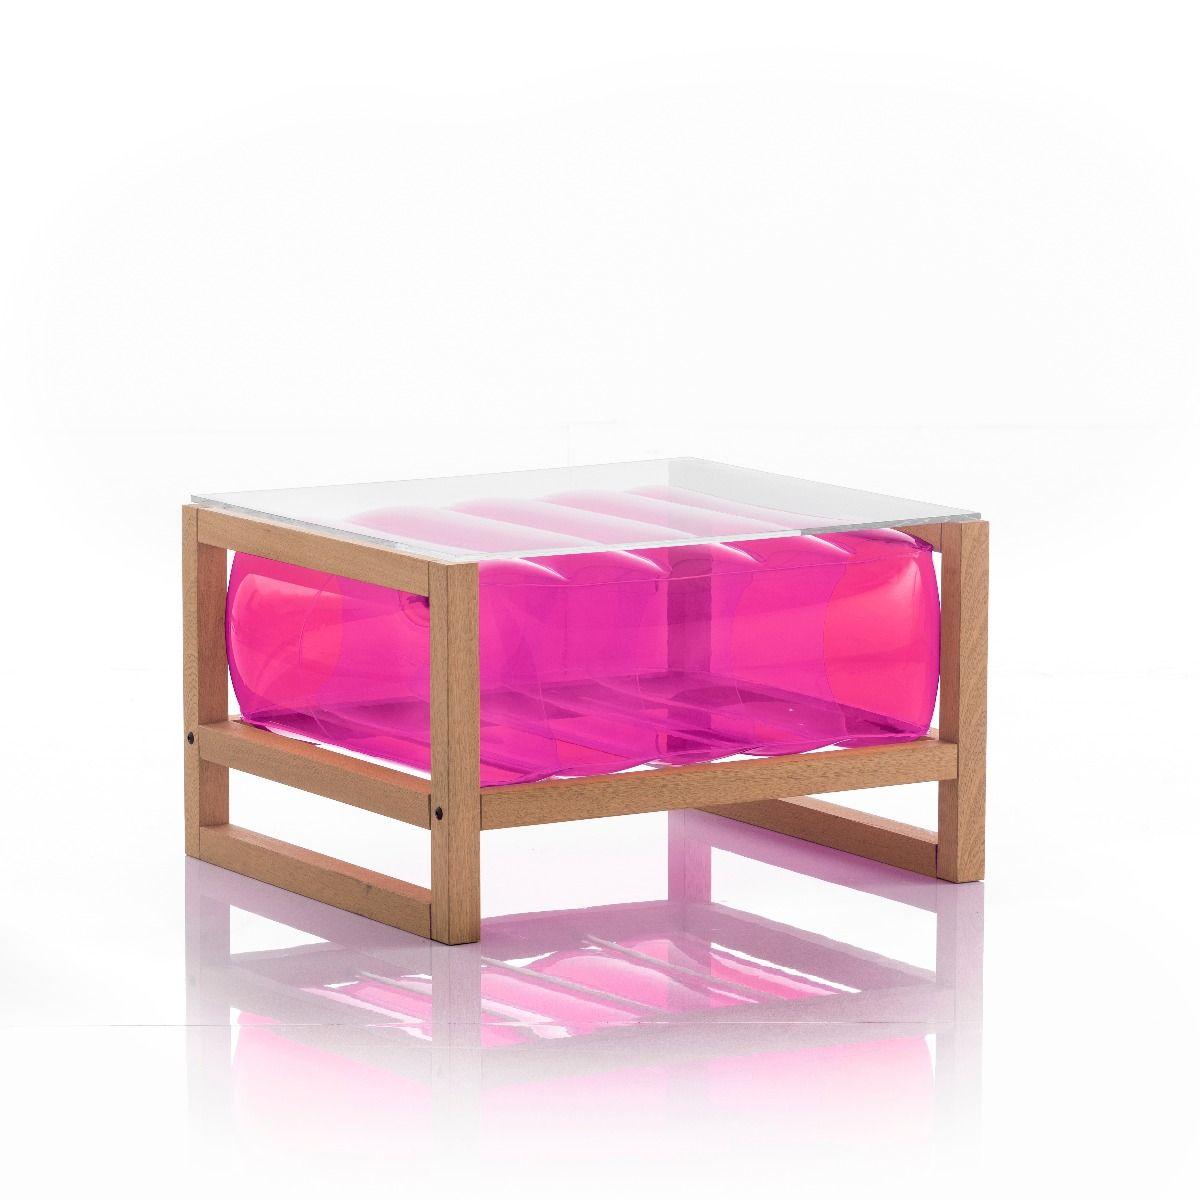 Table basse en bois et tpu rose